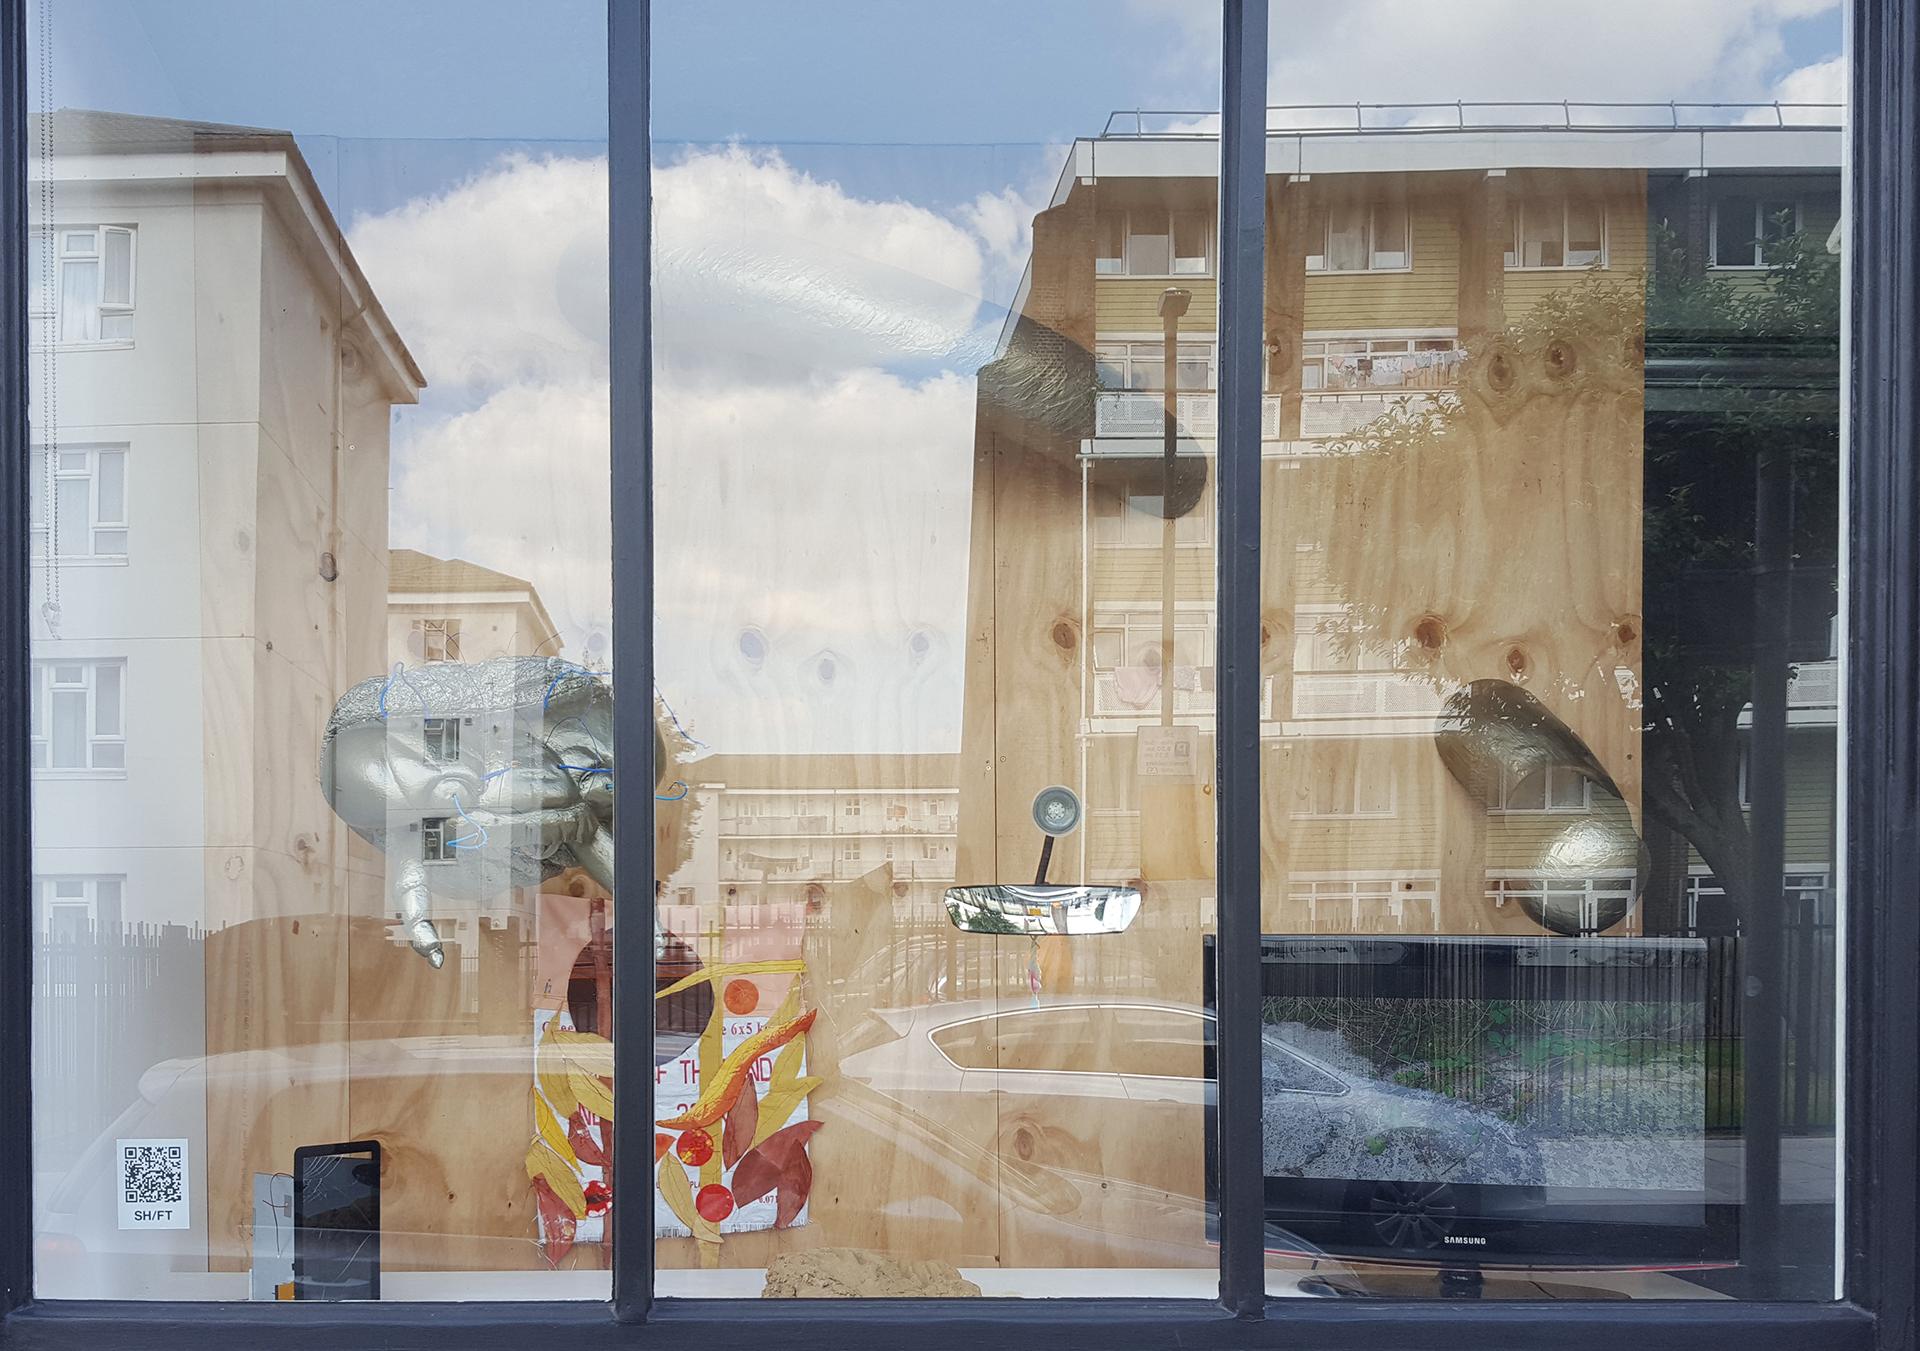 Haffendi Anuar/ Veronika Neukirch, Davinia-Ann Robinson, Elisabeth Molin, Serra Tansel, SH/FT installation view, 2021